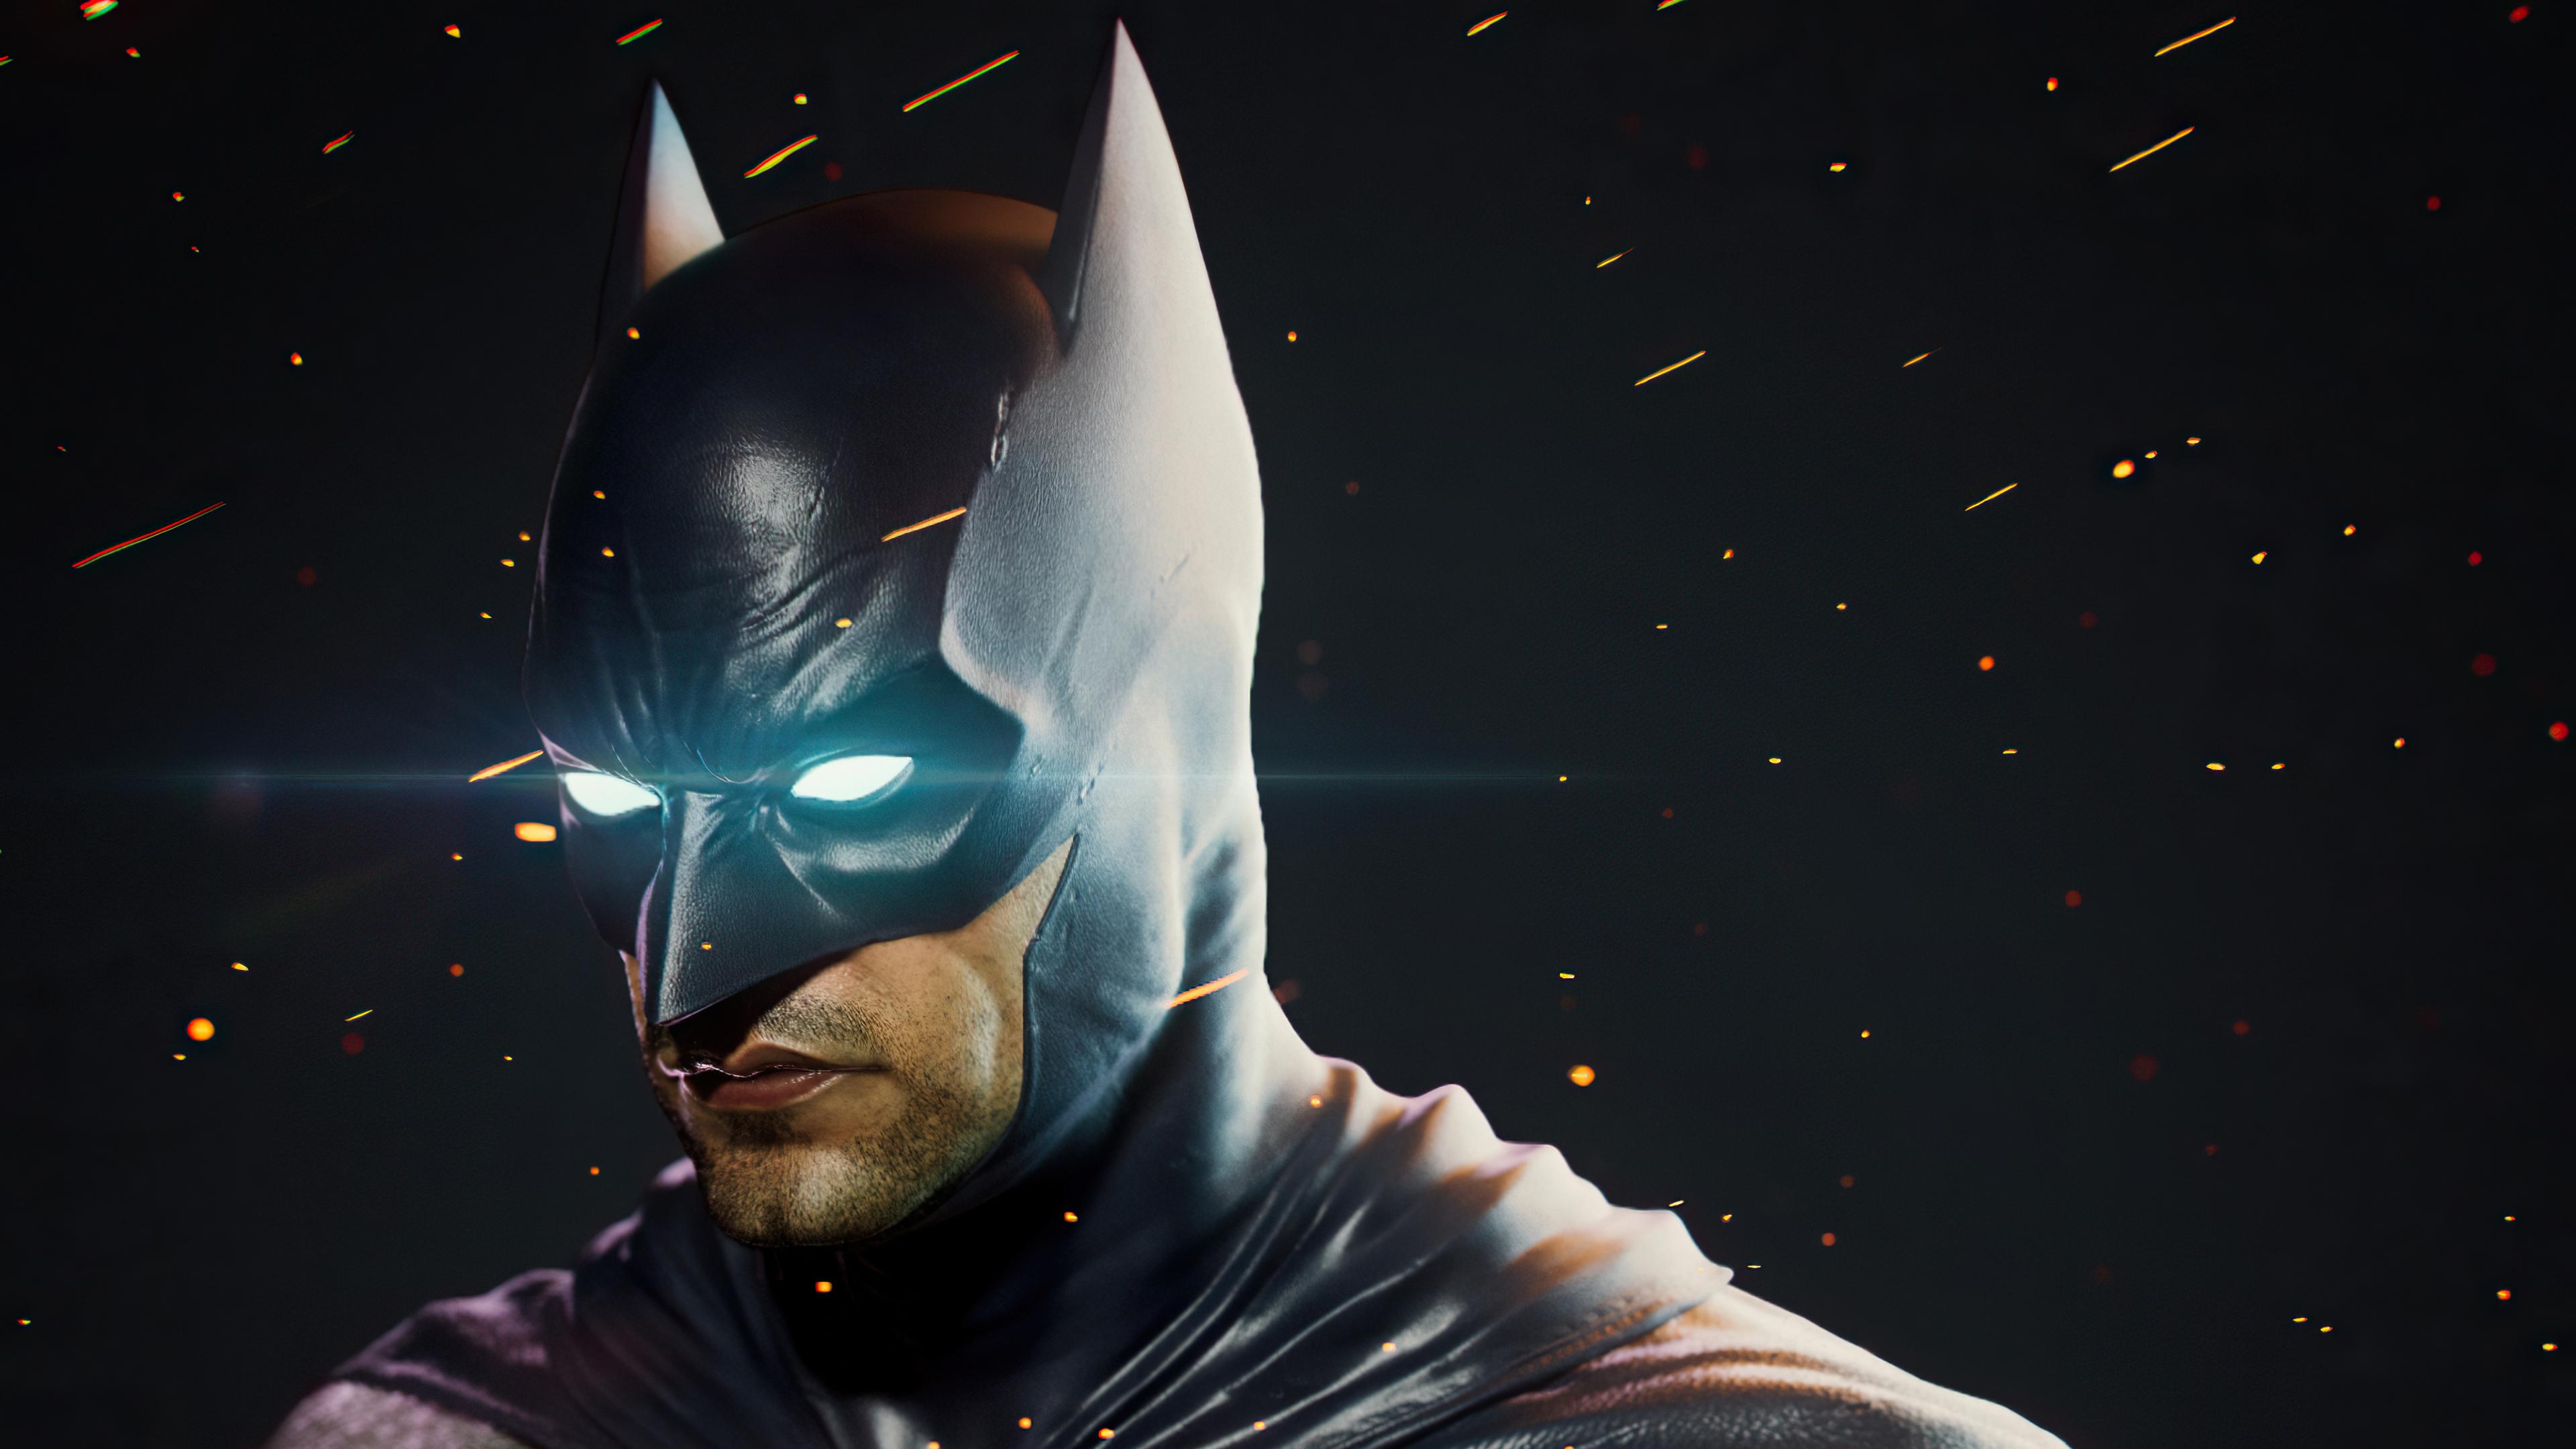 the batman darkness 4k 1616960334 - The Batman Darkness 4k - The Batman Darkness 4k wallpapers